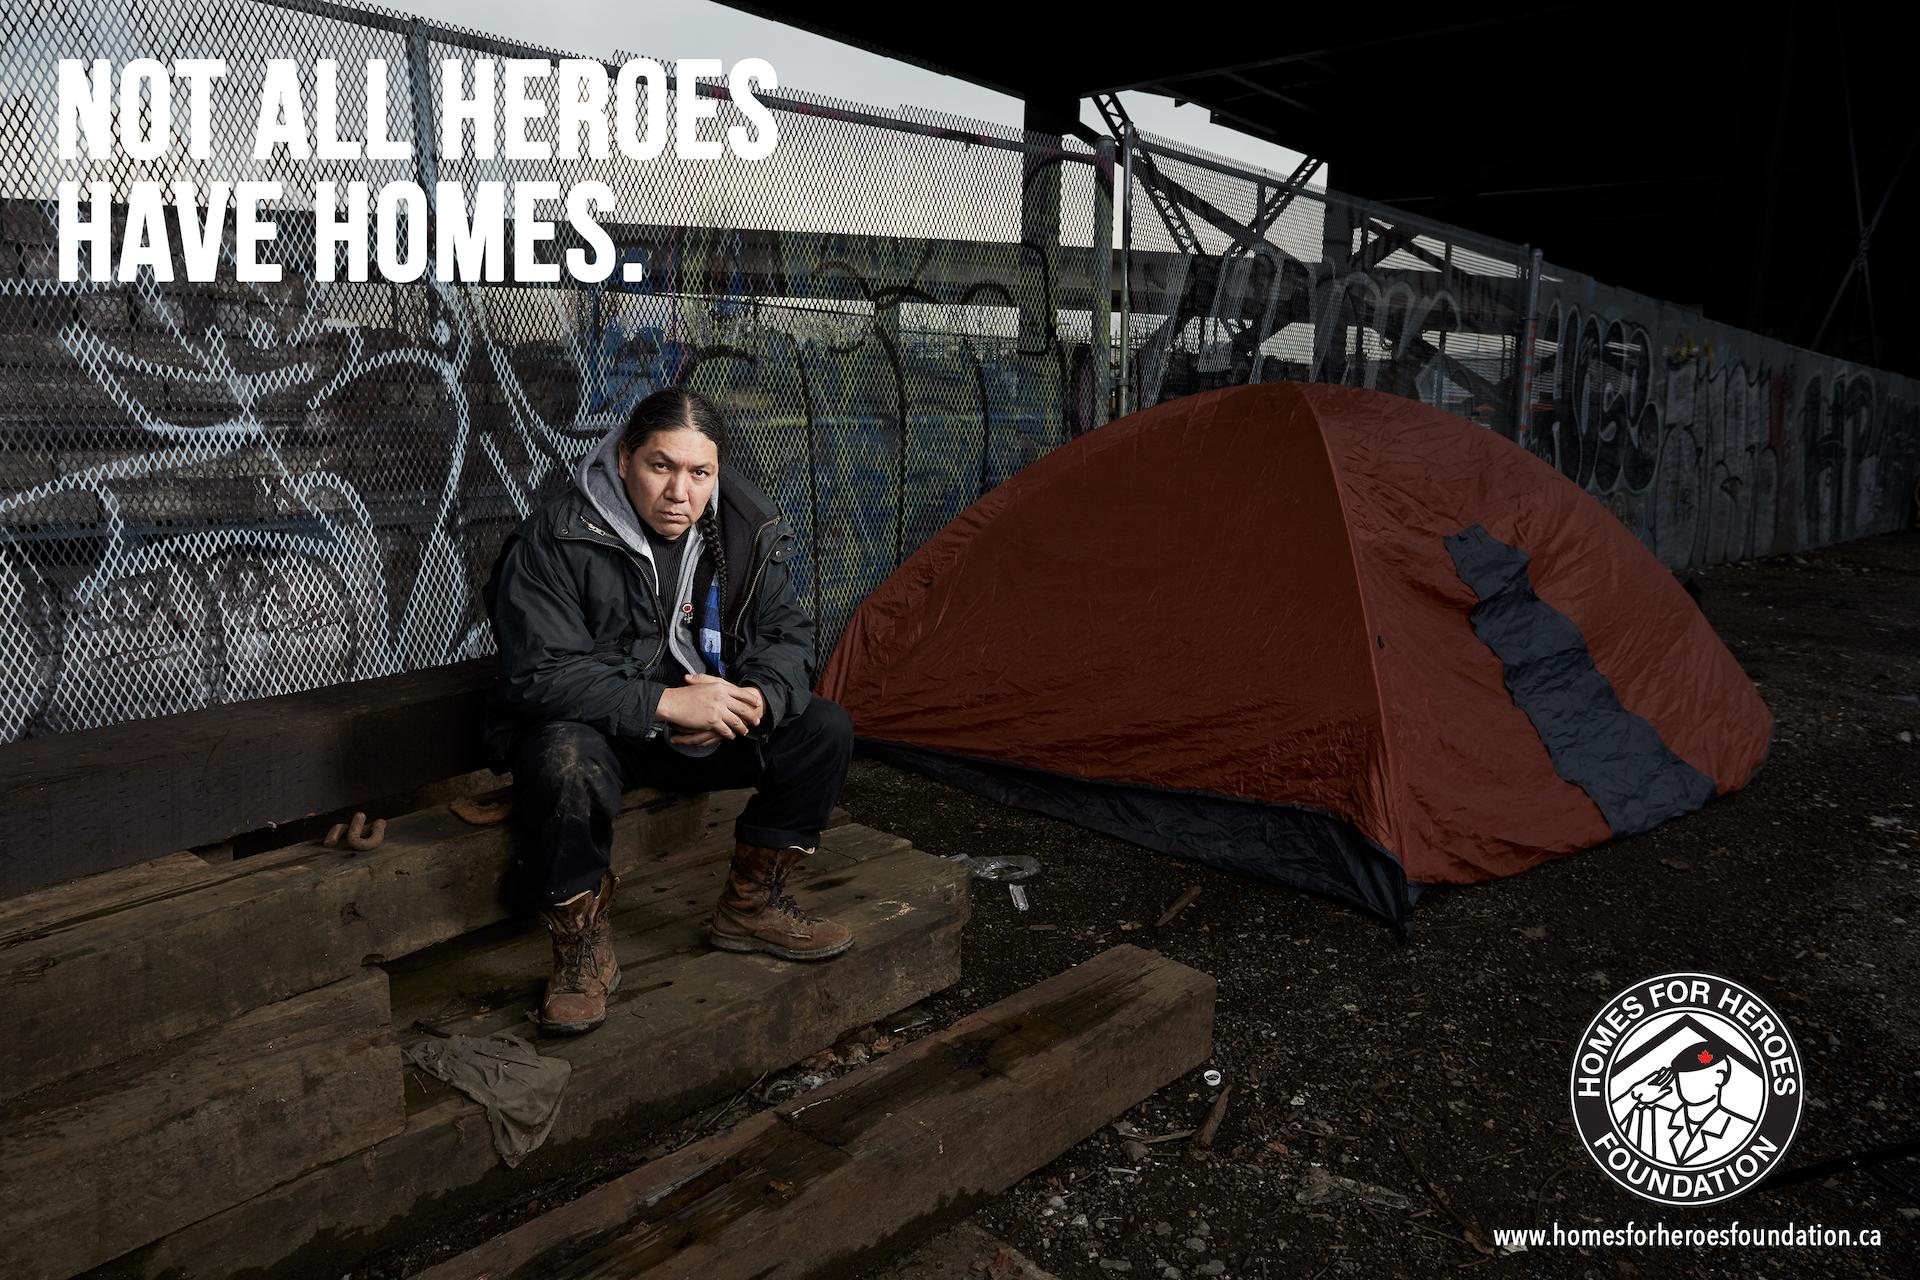 Homeless Veteran Ad in Lurzers